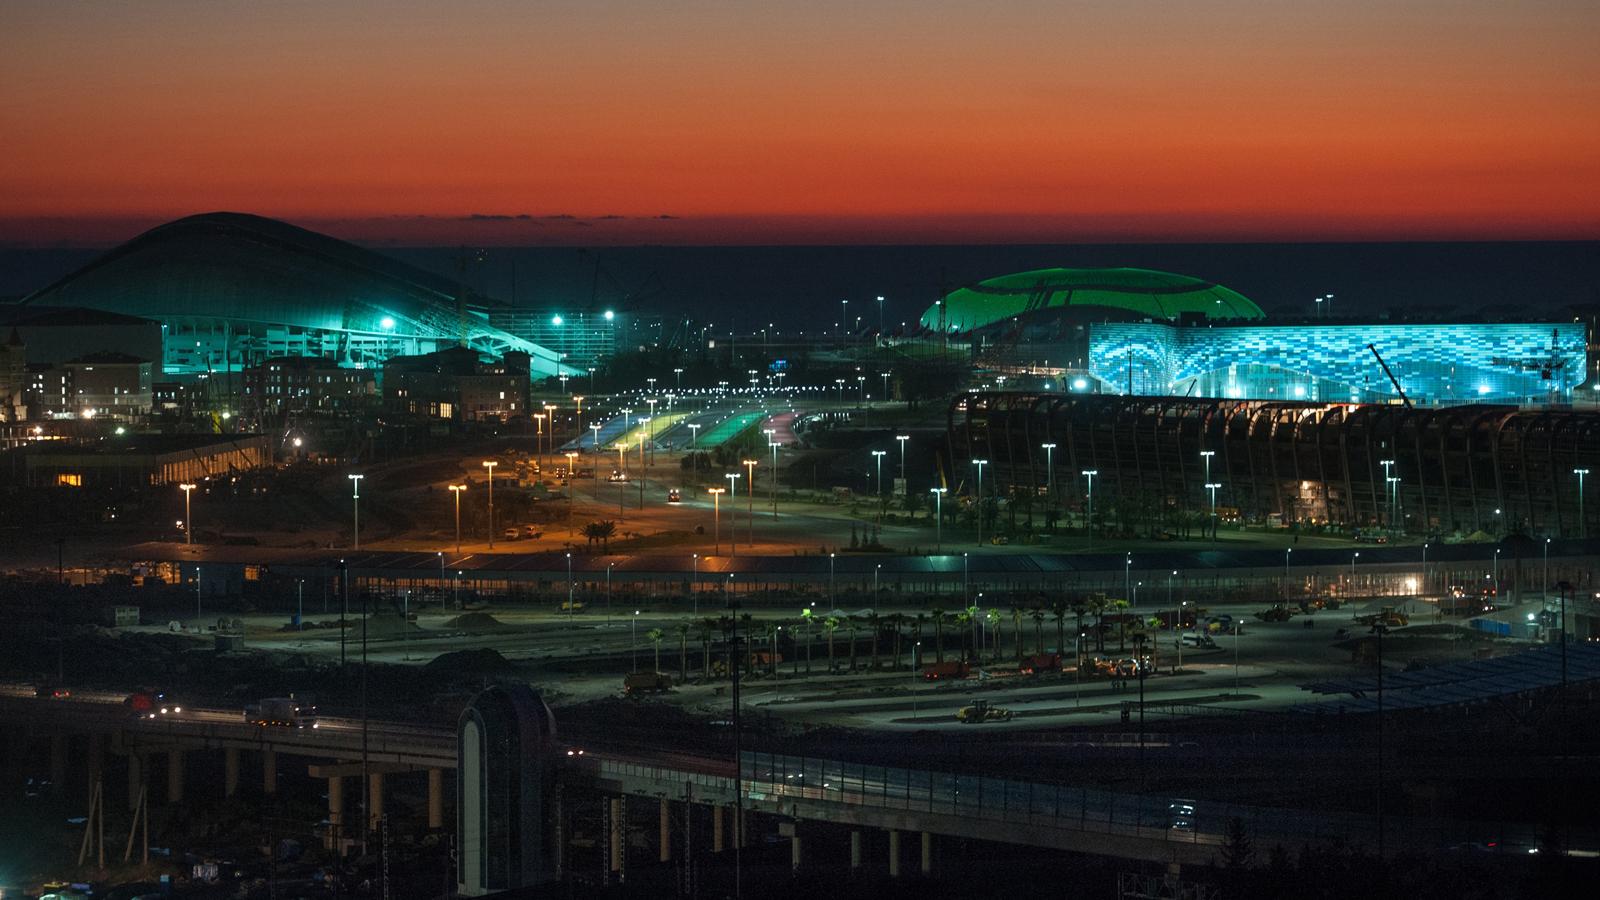 Russia Sochi 2014 Winter Olympics Venues